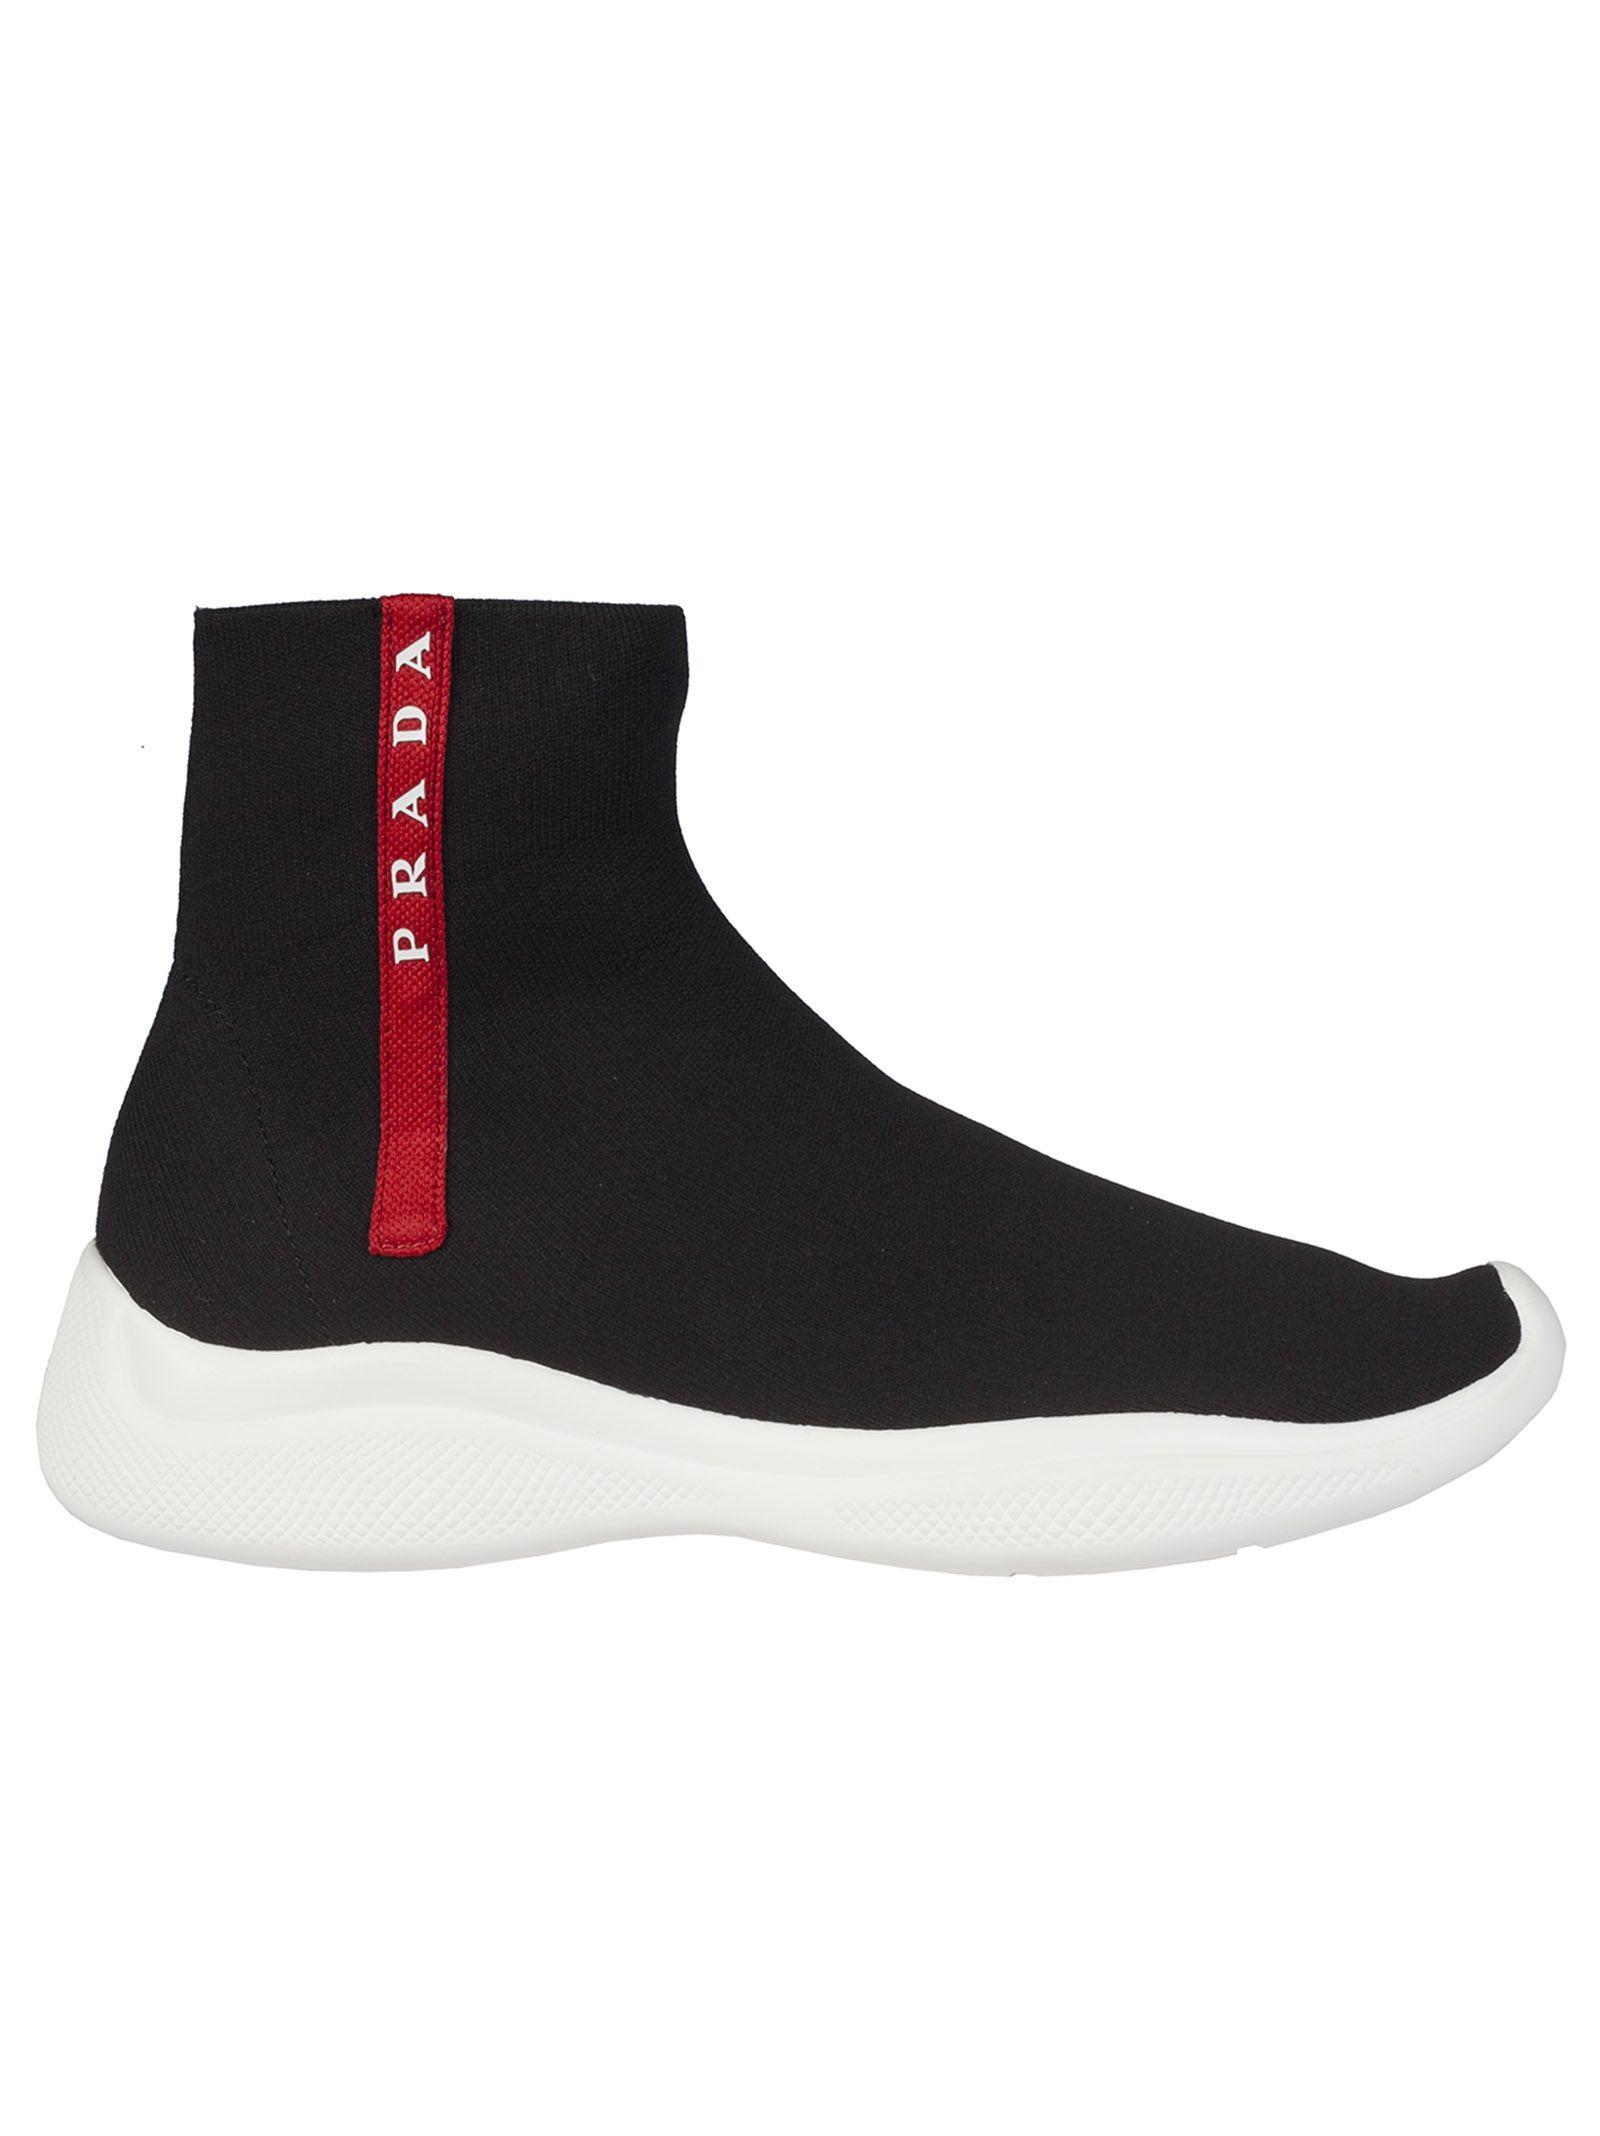 5b1ab5717cfc Prada Linea Rossa Prada Linea Rossa Knitted Hi-top Sneakers - Nero ...